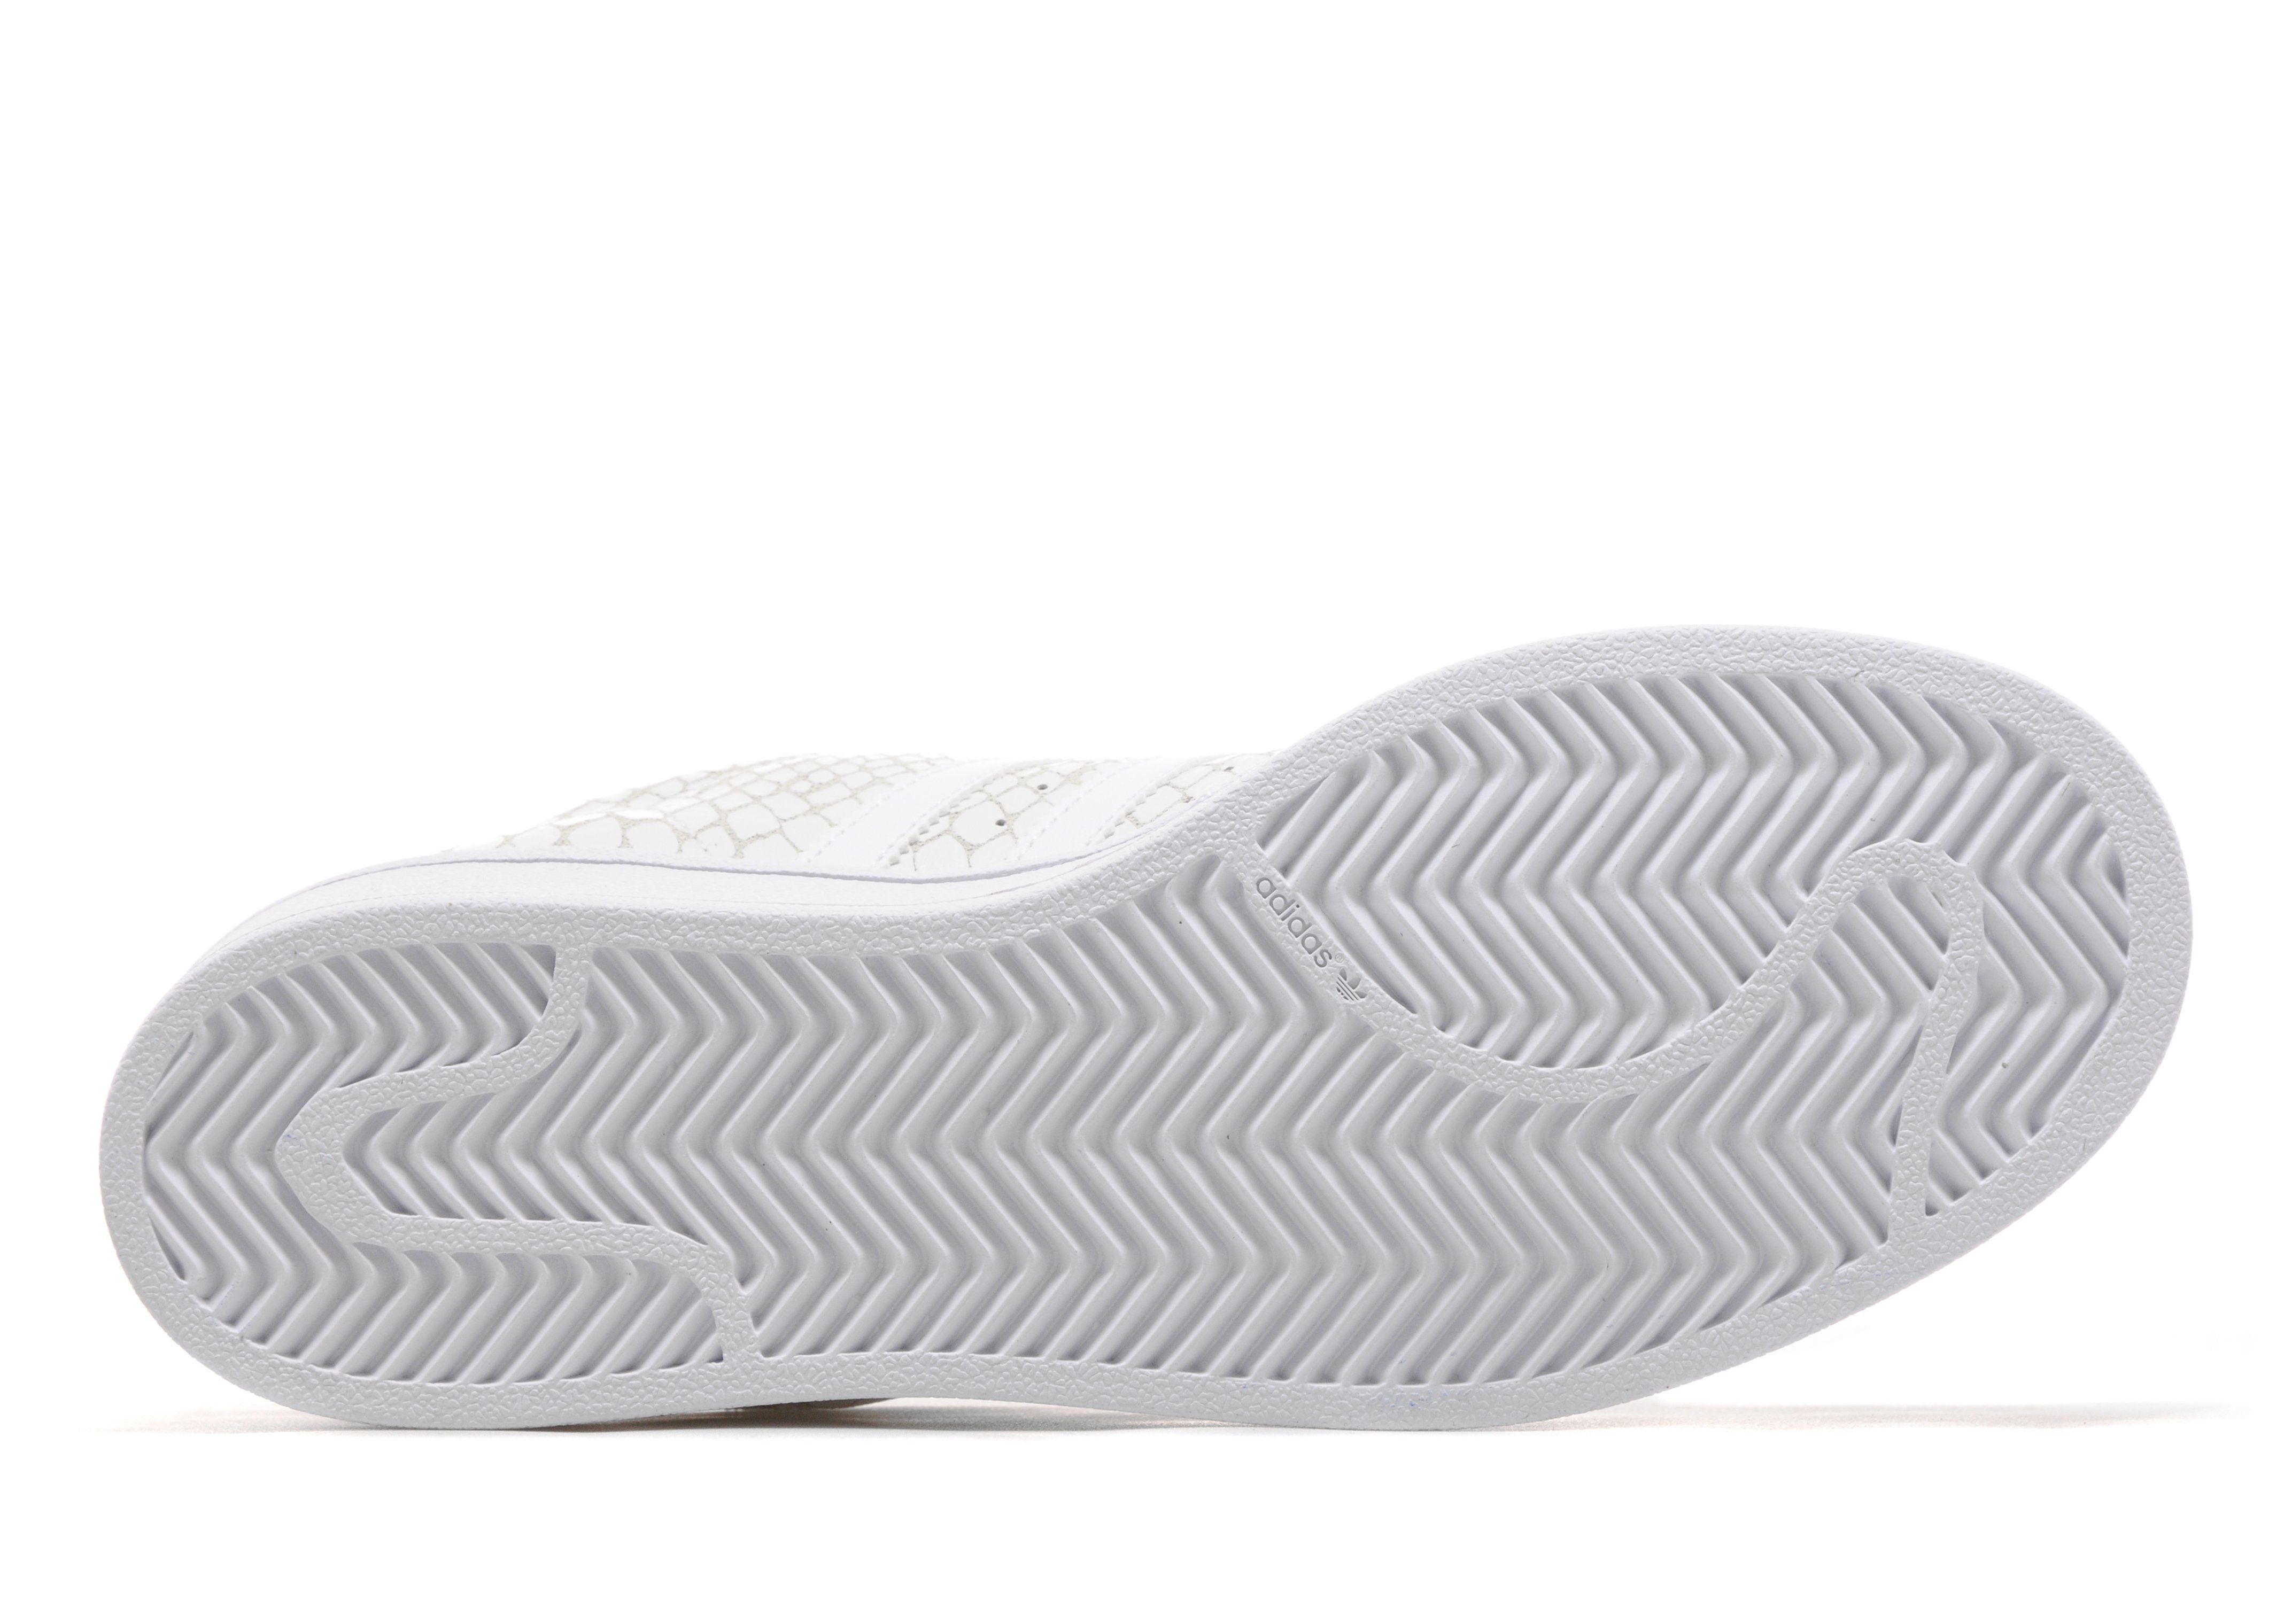 adidas Originals Superstar Snake Women's